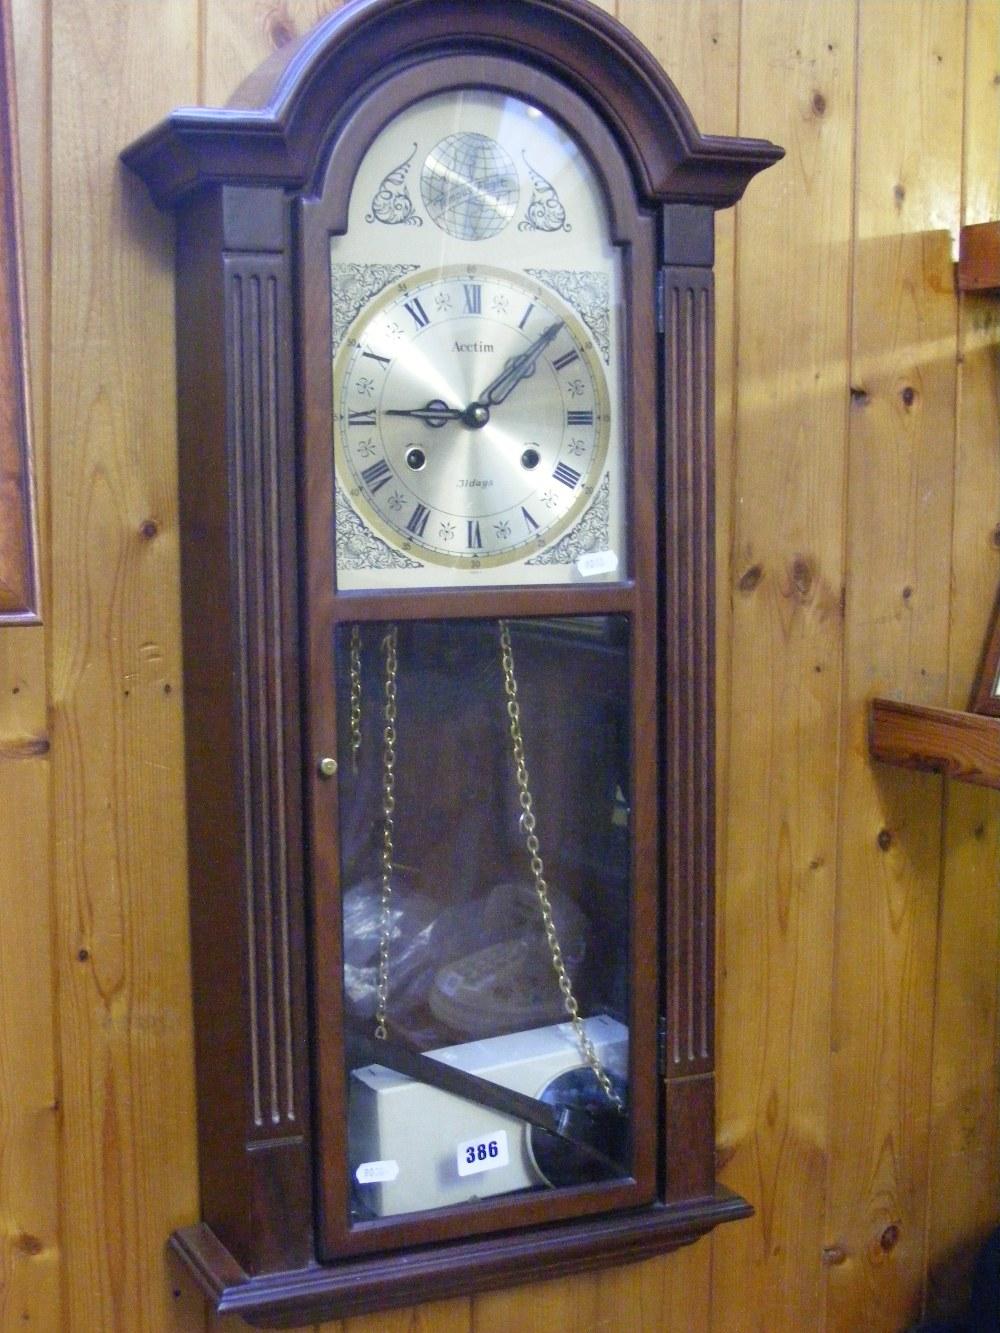 An acctim 31 day wall clock lot 386 an acctim 31 day wall clock amipublicfo Choice Image